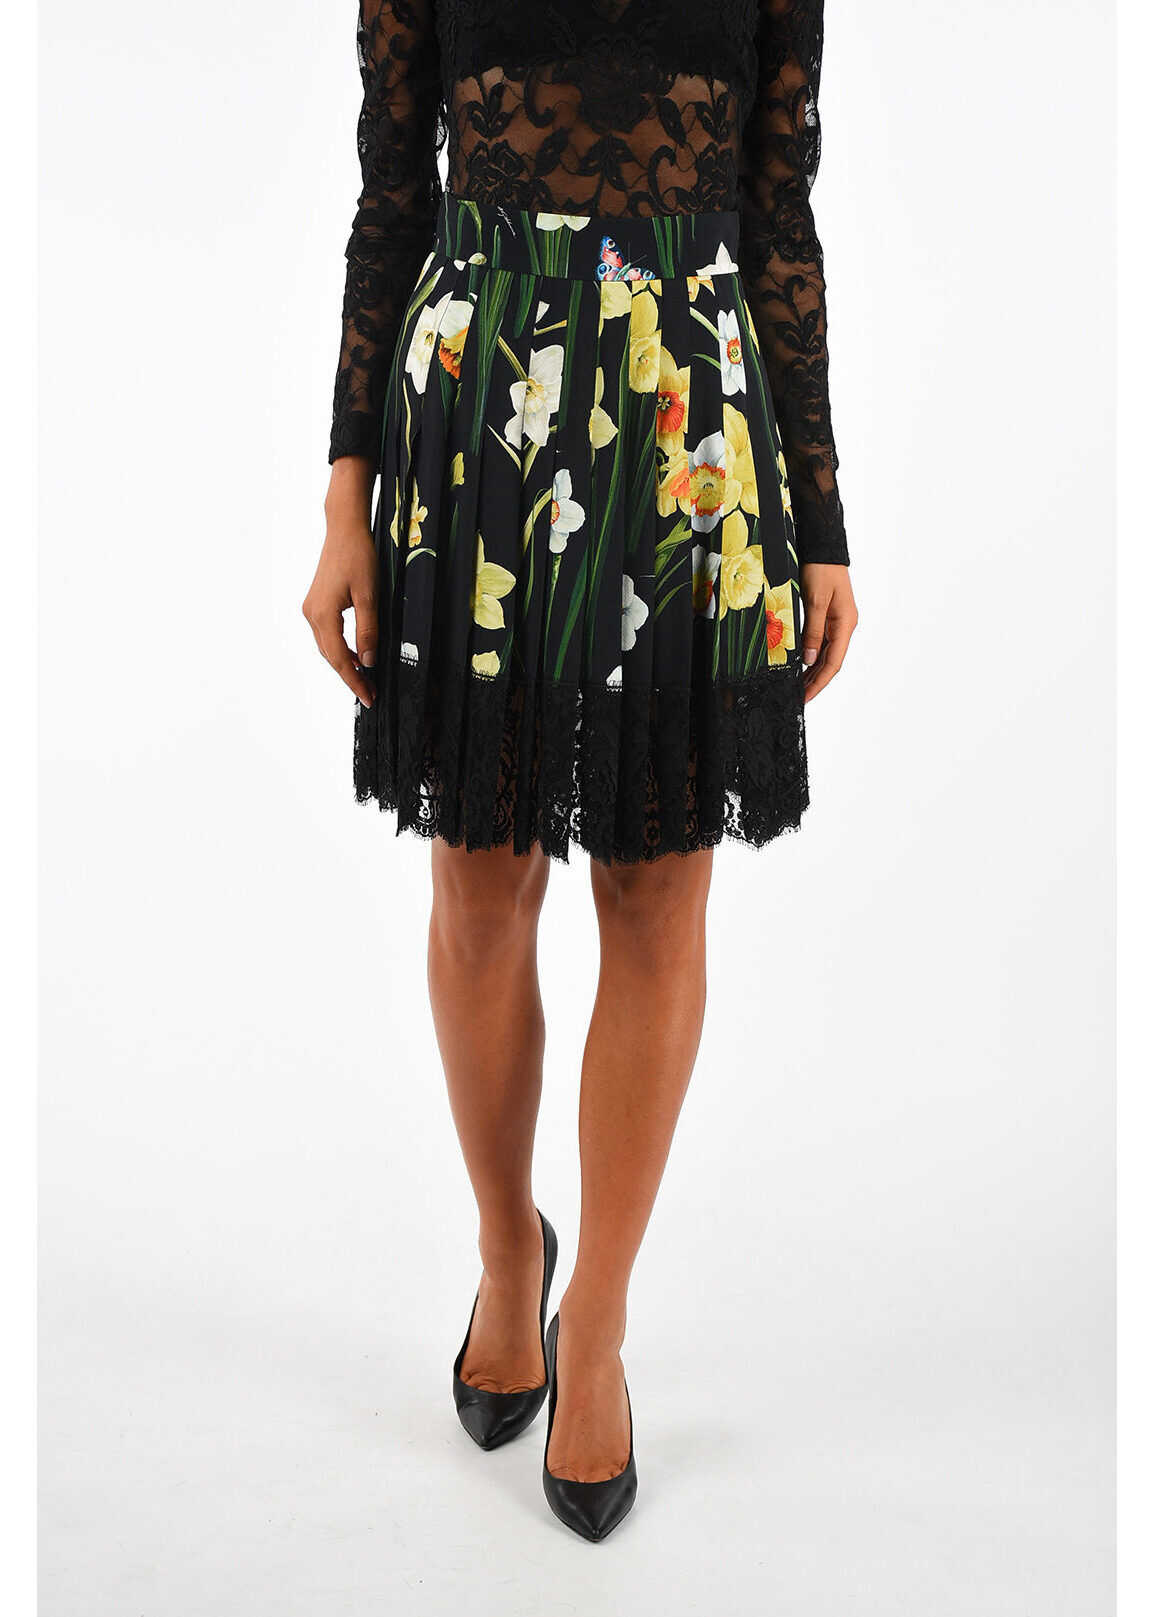 Dolce & Gabbana floral-print circle skirt BLACK